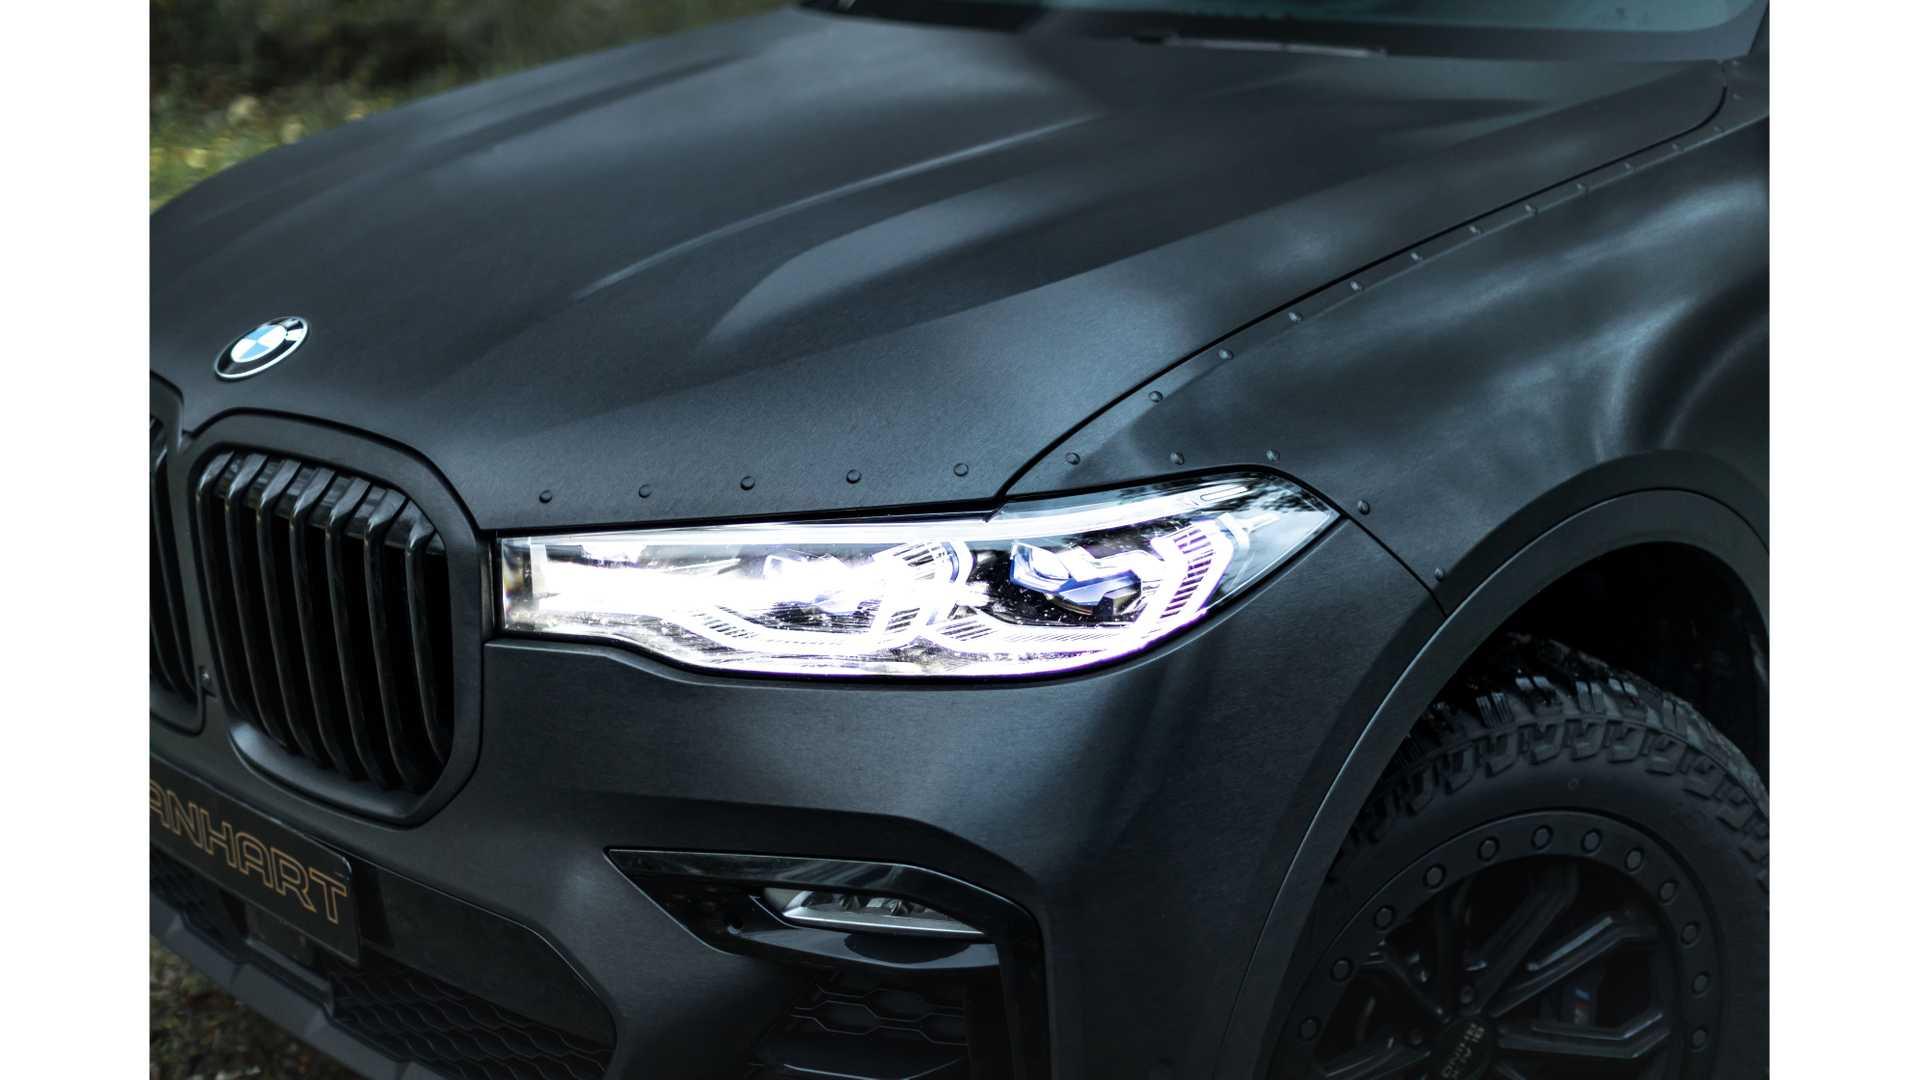 BMW-X7-Dirt-Edition-By-Manhart-8